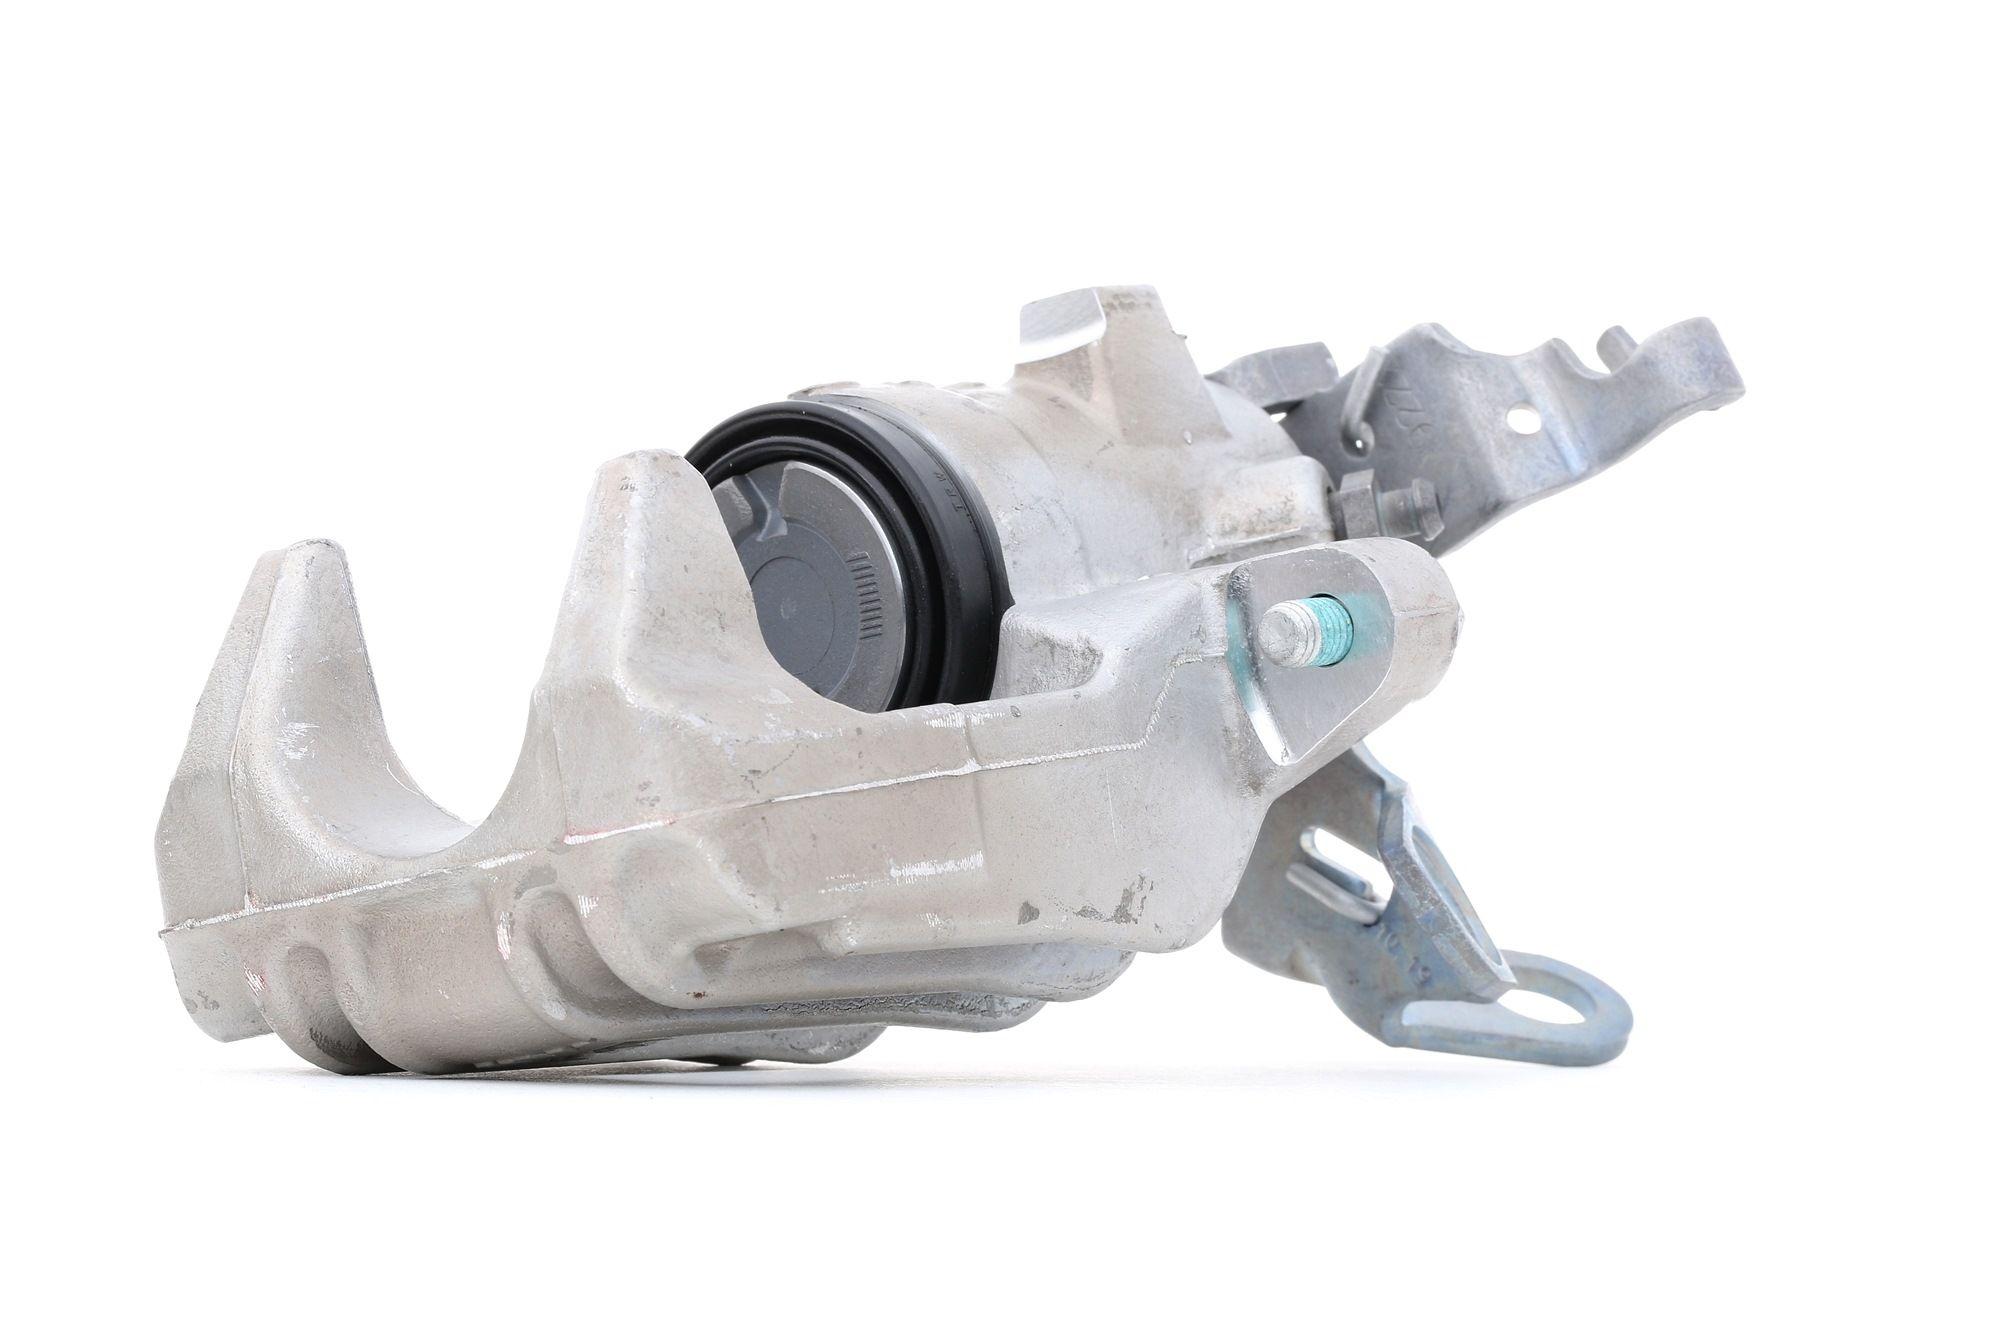 Caliper BHN318E TRW — only new parts